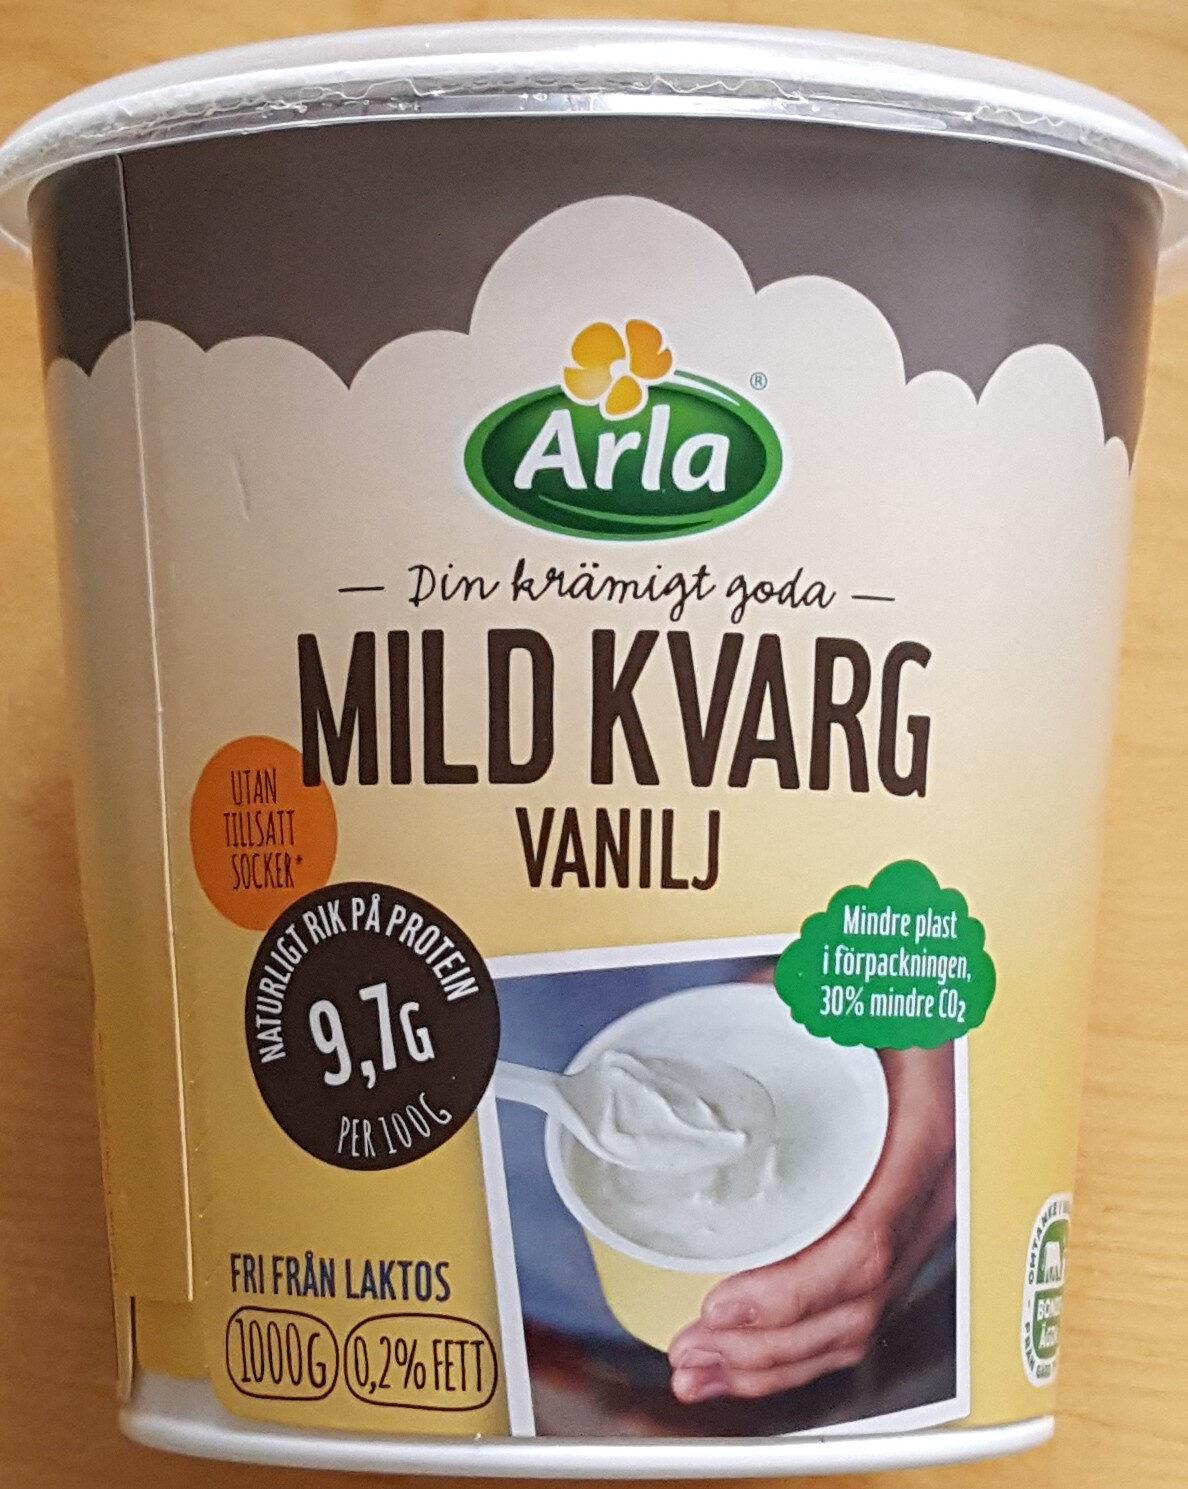 Mild Kvarg - Vanilj - Produit - sv